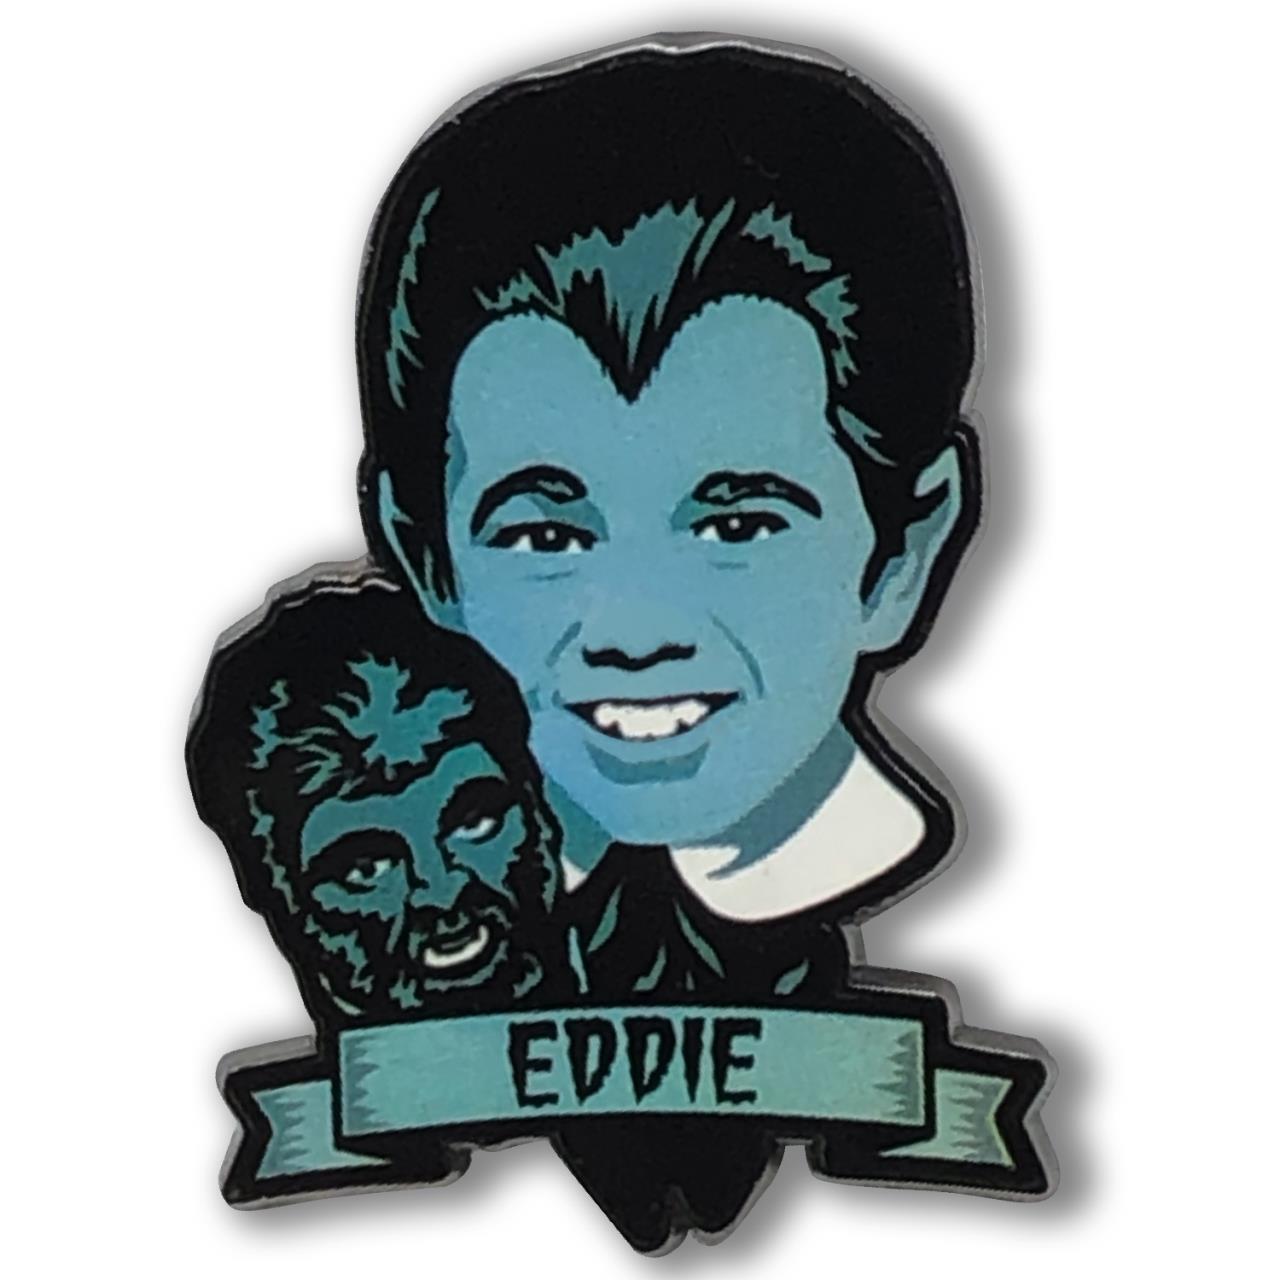 Eddie Munster Collectable Pin* - 0659682815503